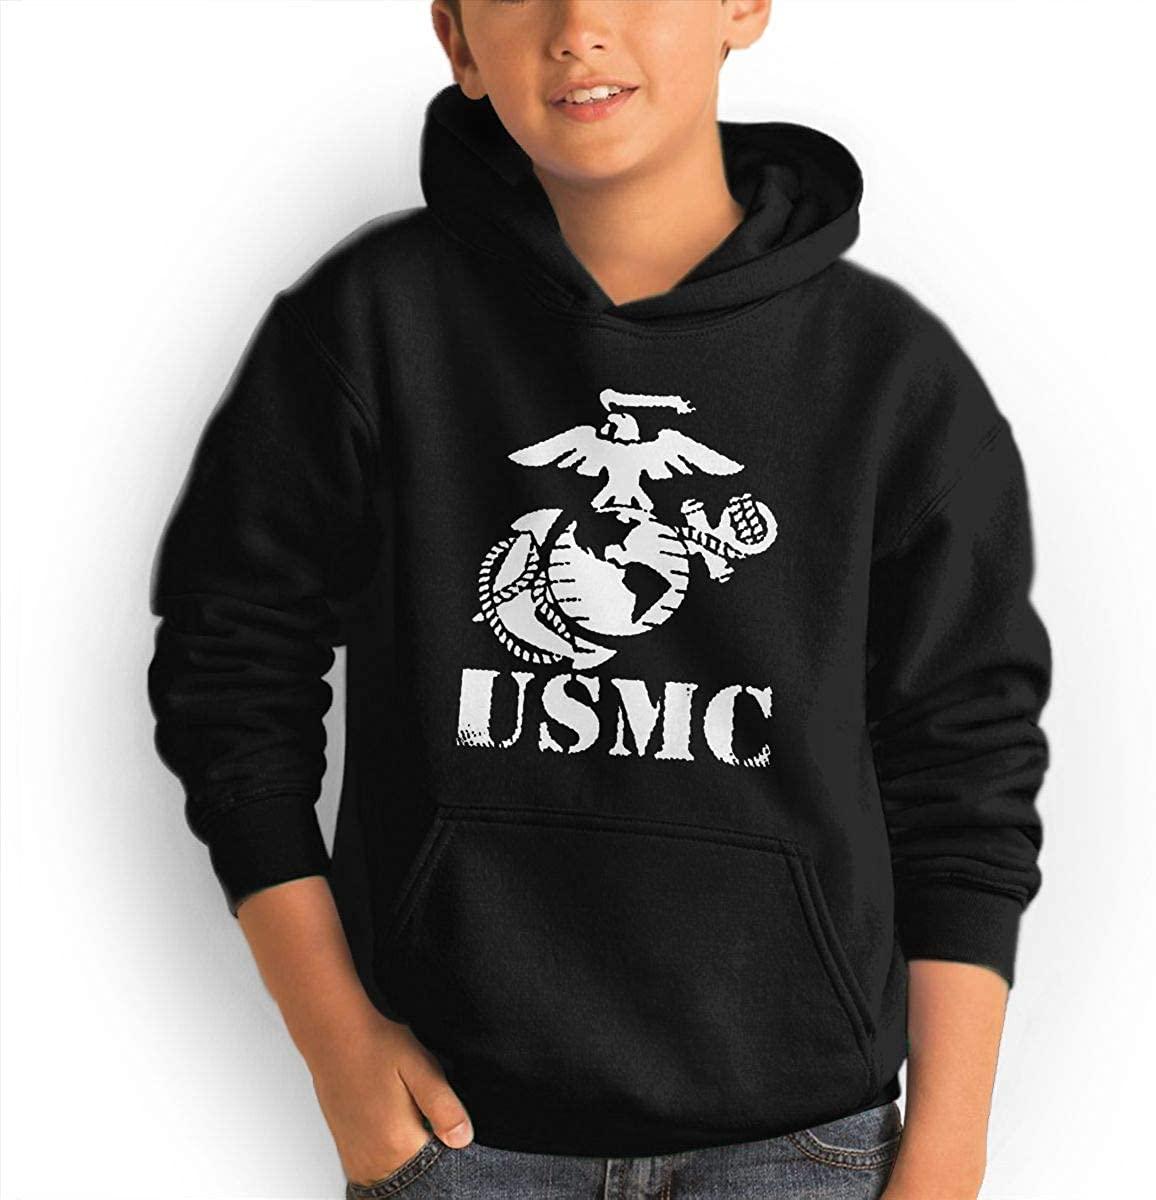 Patricia FordT Youth Hooded Sweatshirt Loose Hooded Sweatshirt USMC Marine Corps Logo Black